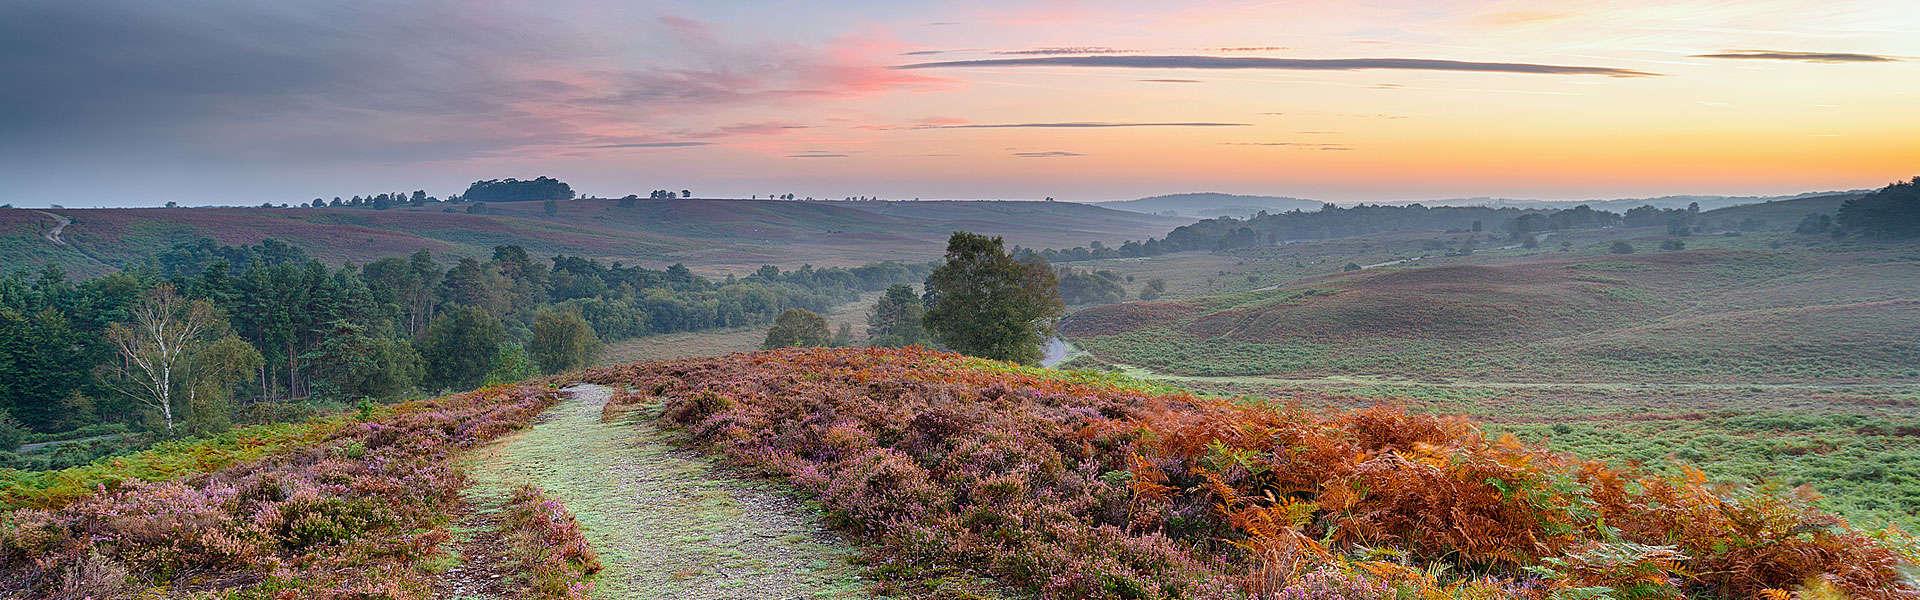 Hampshire - Perfektes Urlaubsziel für Aktivurlaub